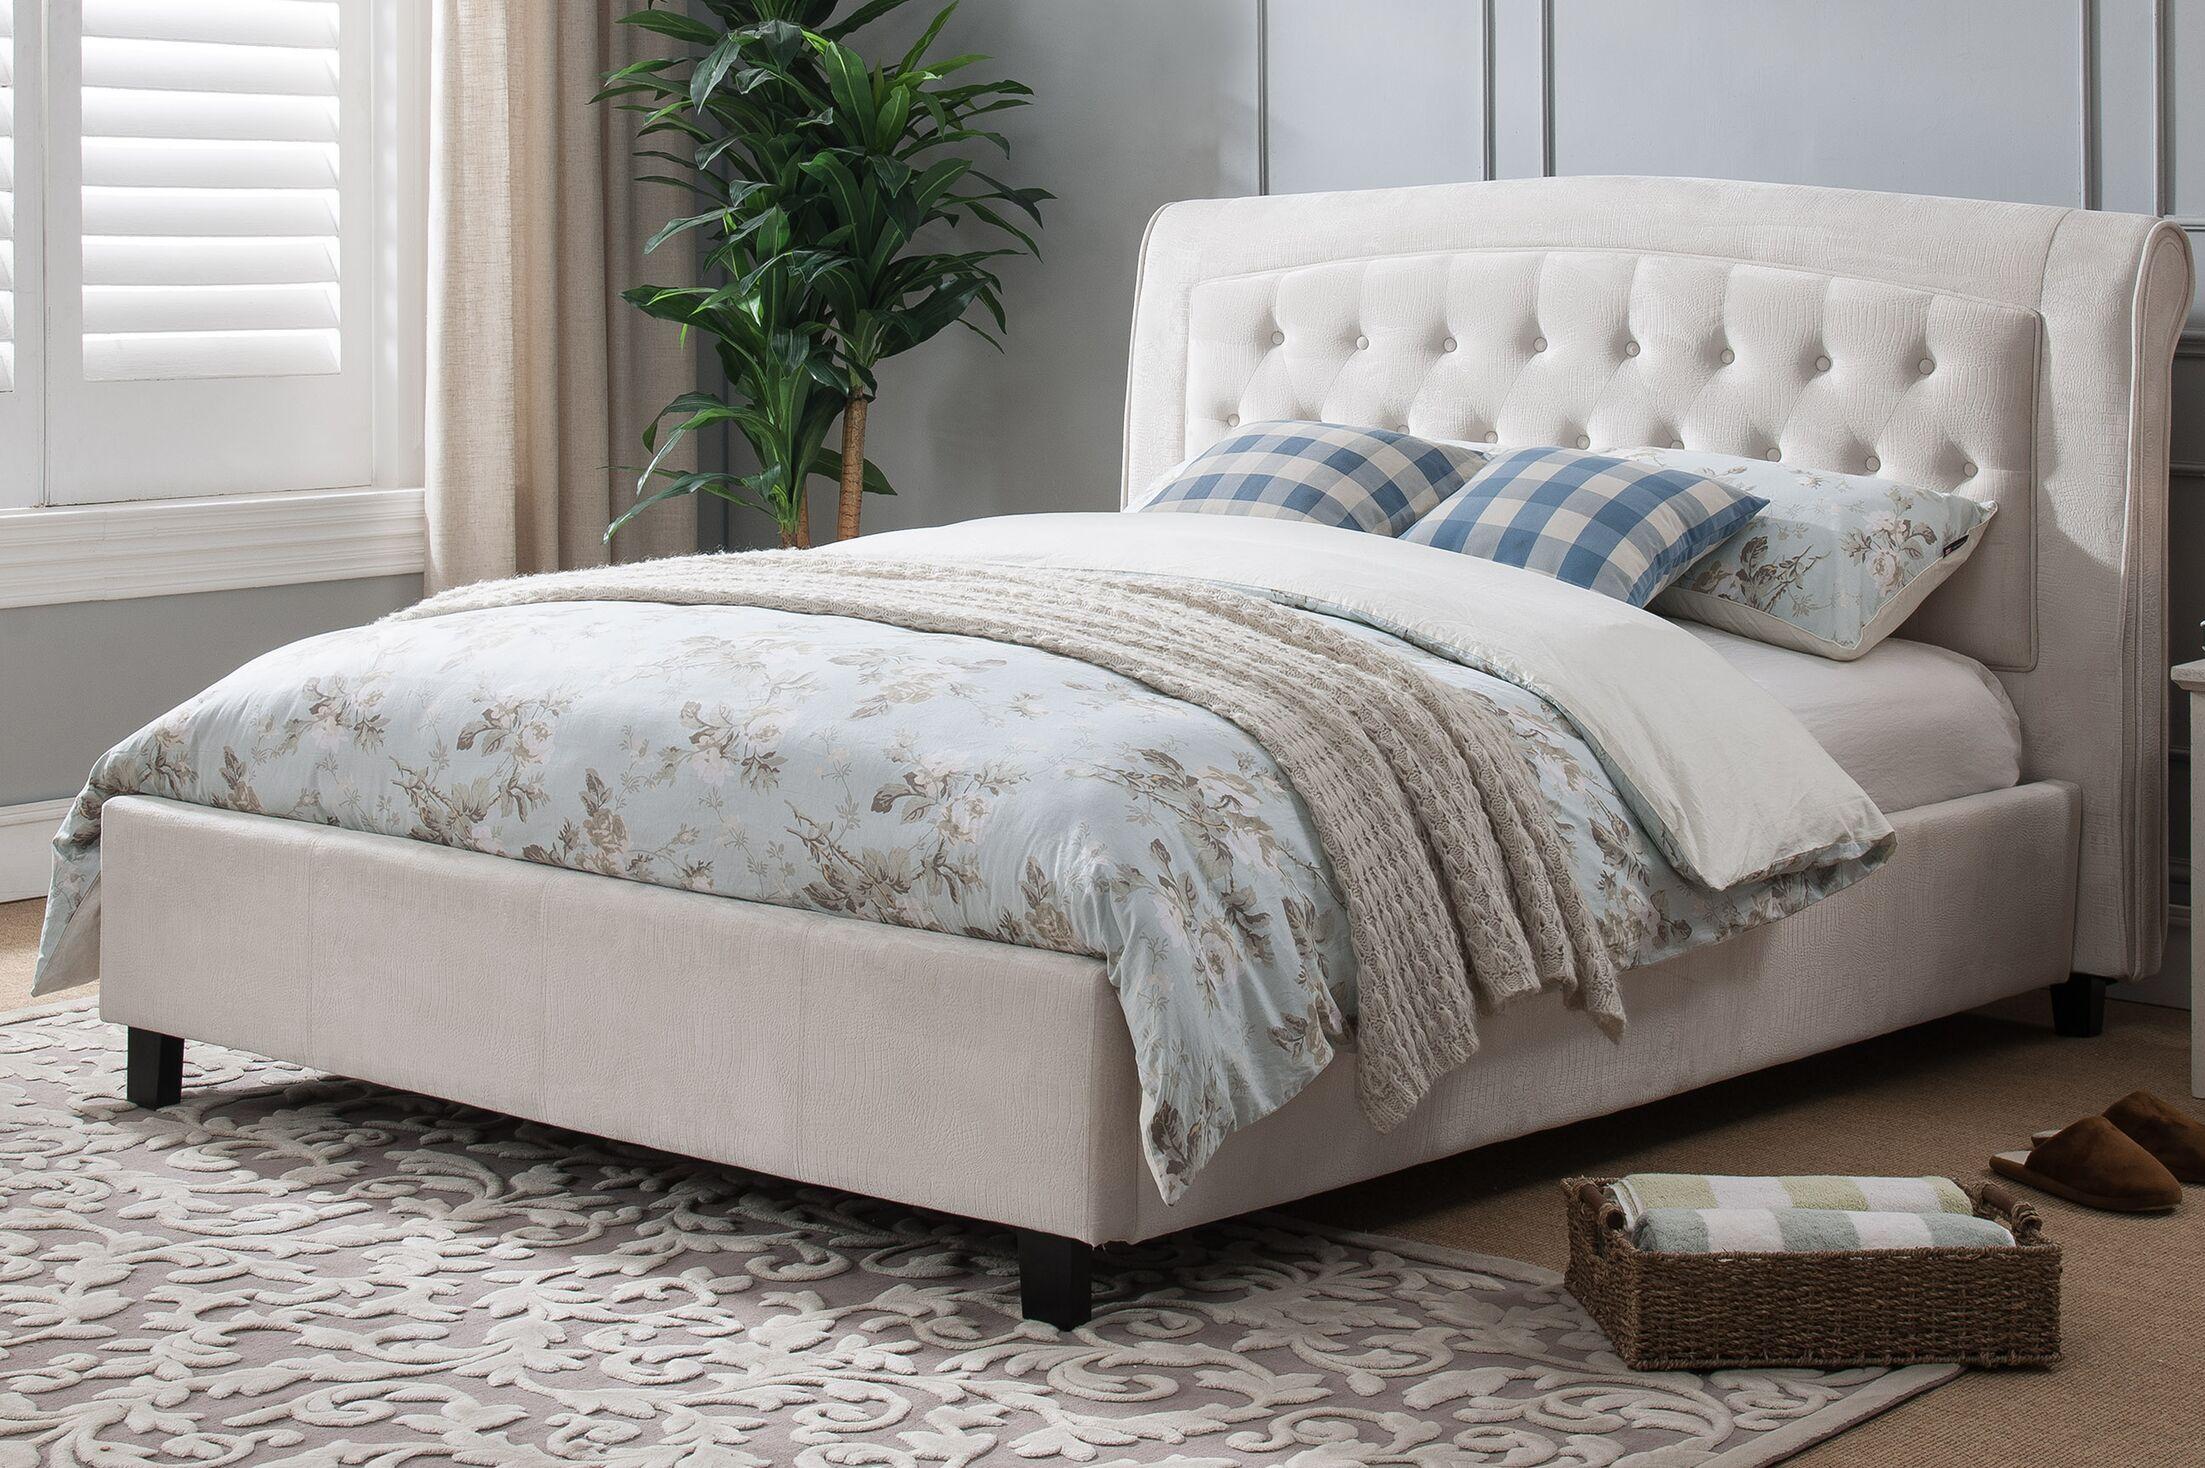 Honoria Upholstered Platform Bed Size: King, Color: Gray